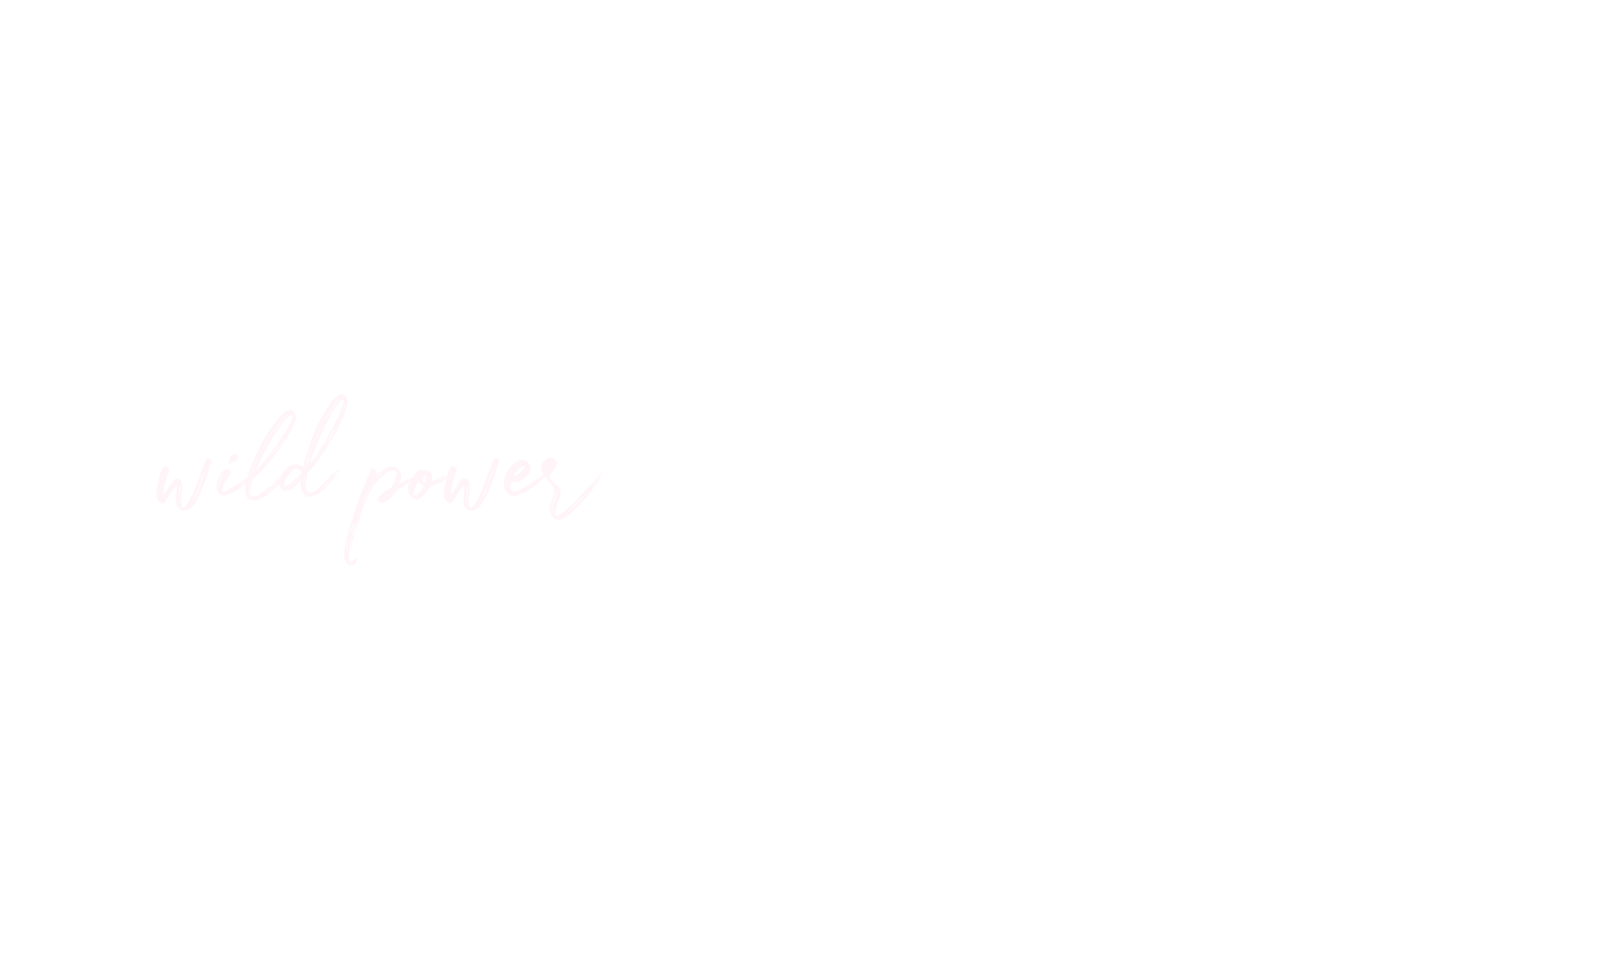 https://termekek.festina.hu/sites/default/files/revslider/image/power_sign.png